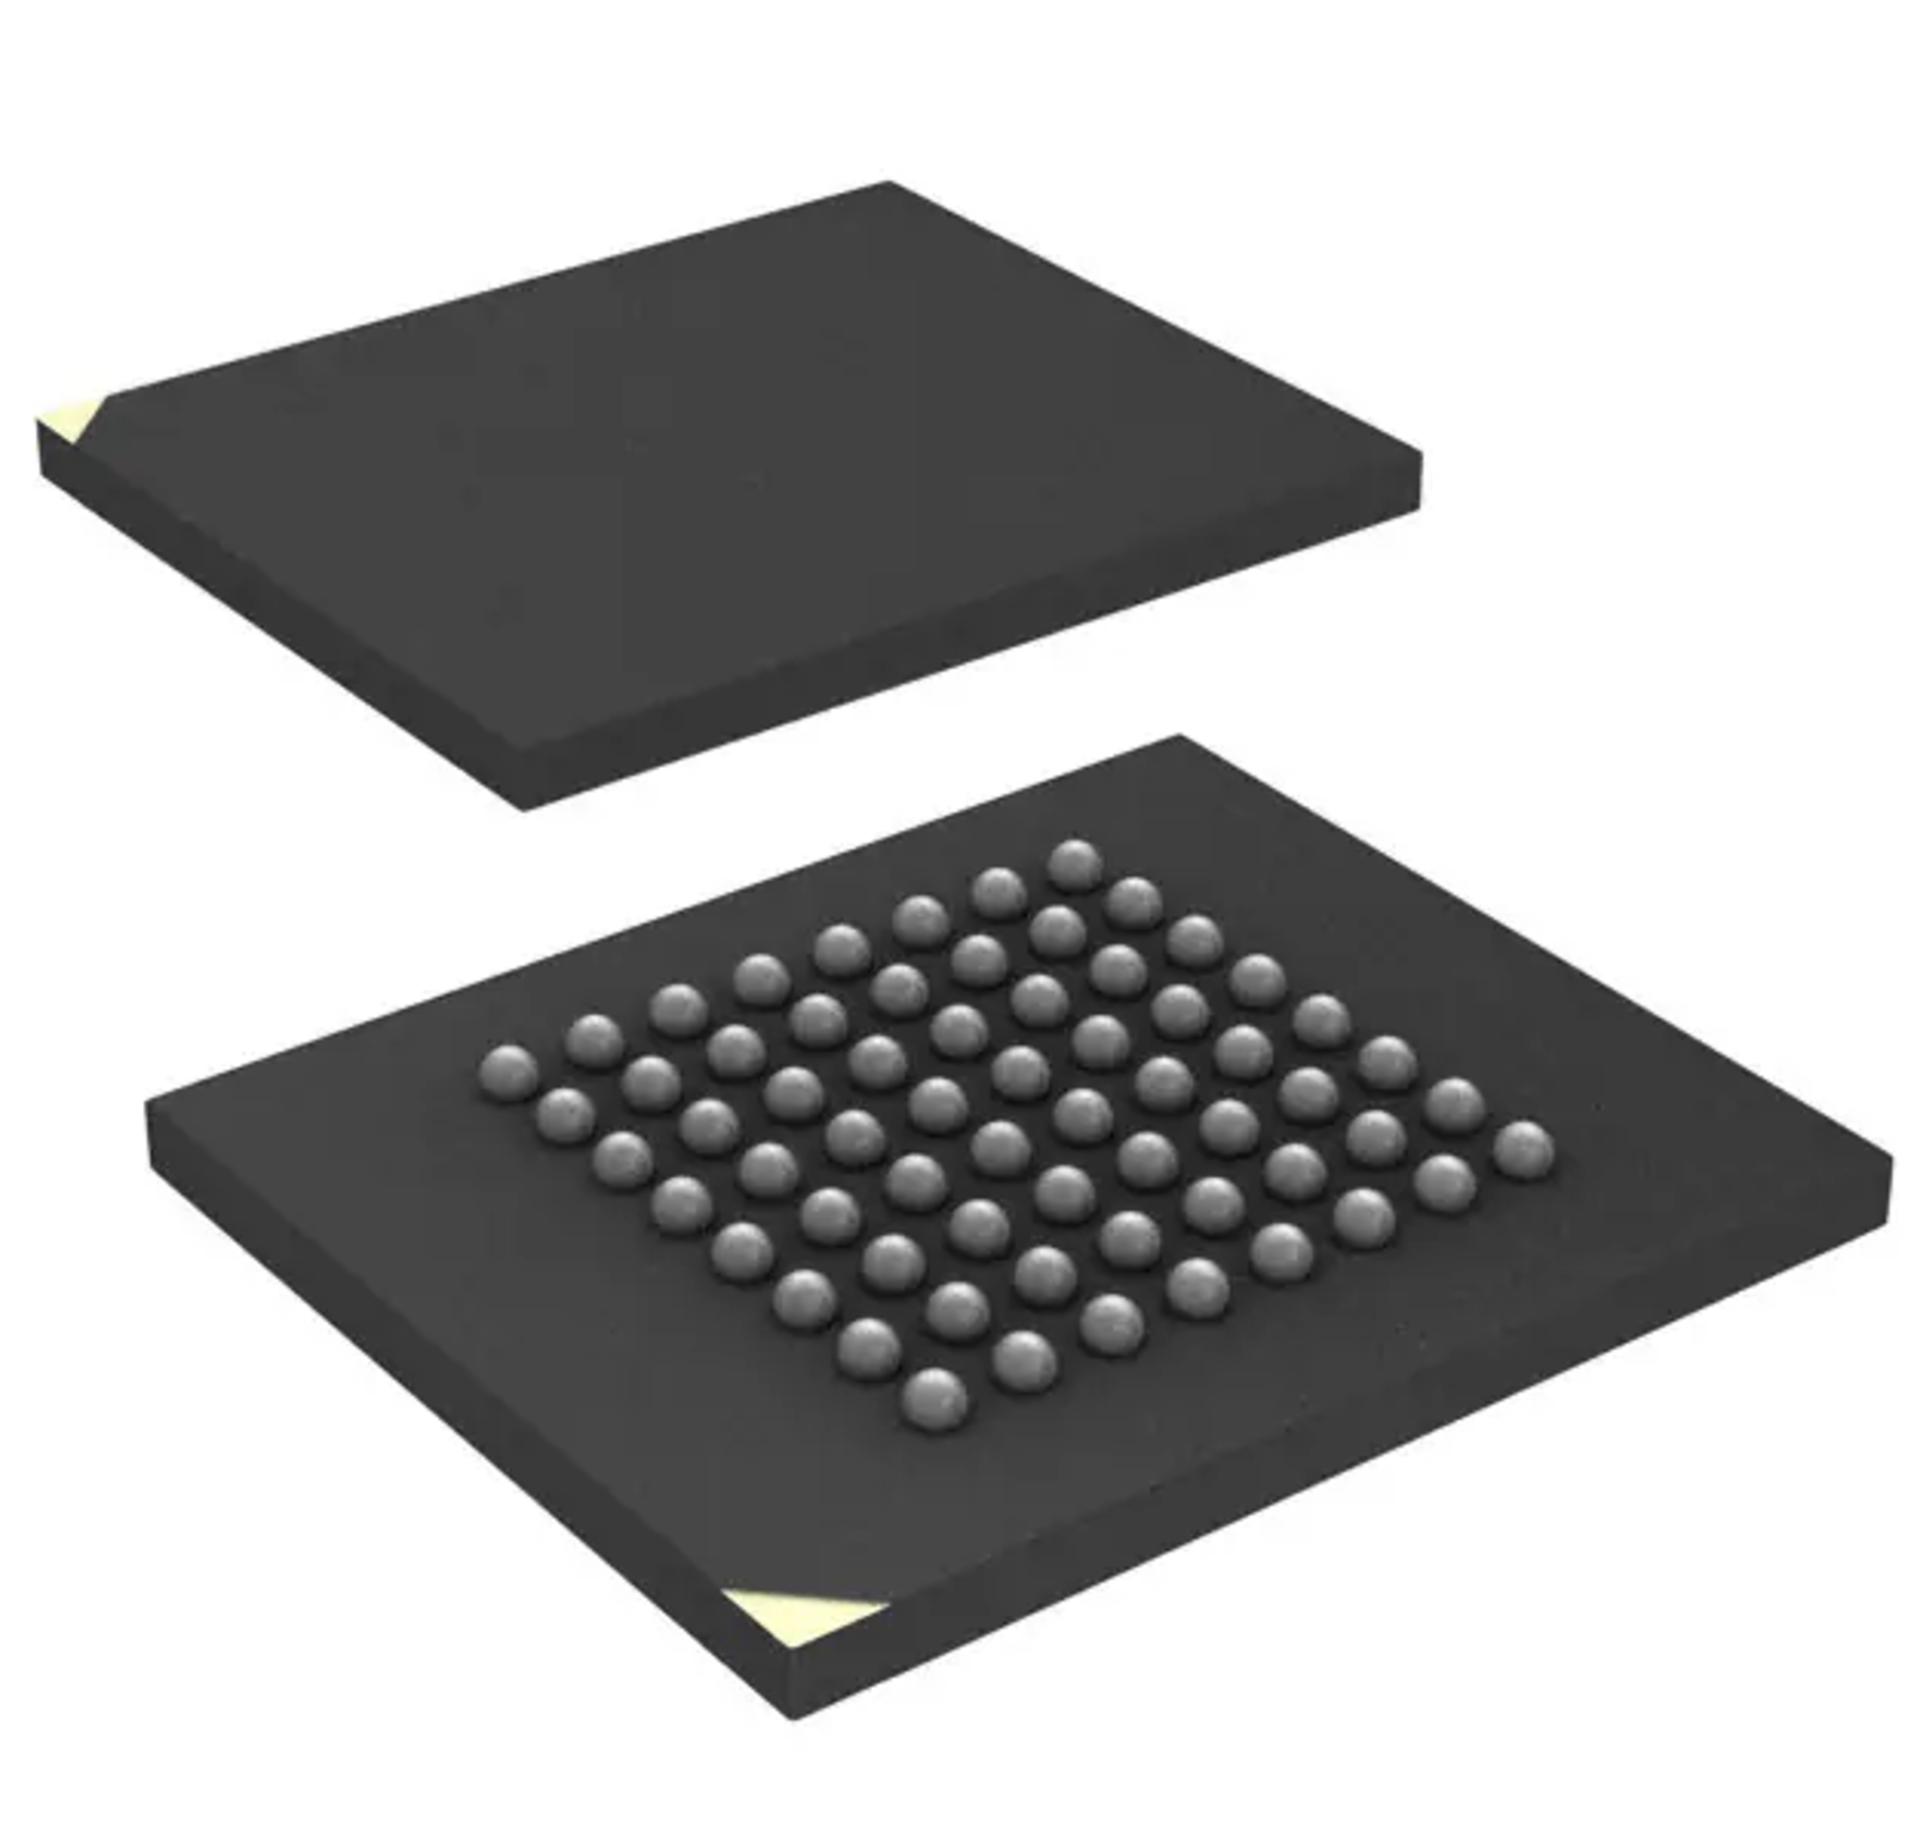 Micron Technology PC28F512M29EWHA, IC FLASH 512MBIT PARALLEL 64FBGA, FLASH - NOR Memory IC 512Mb (